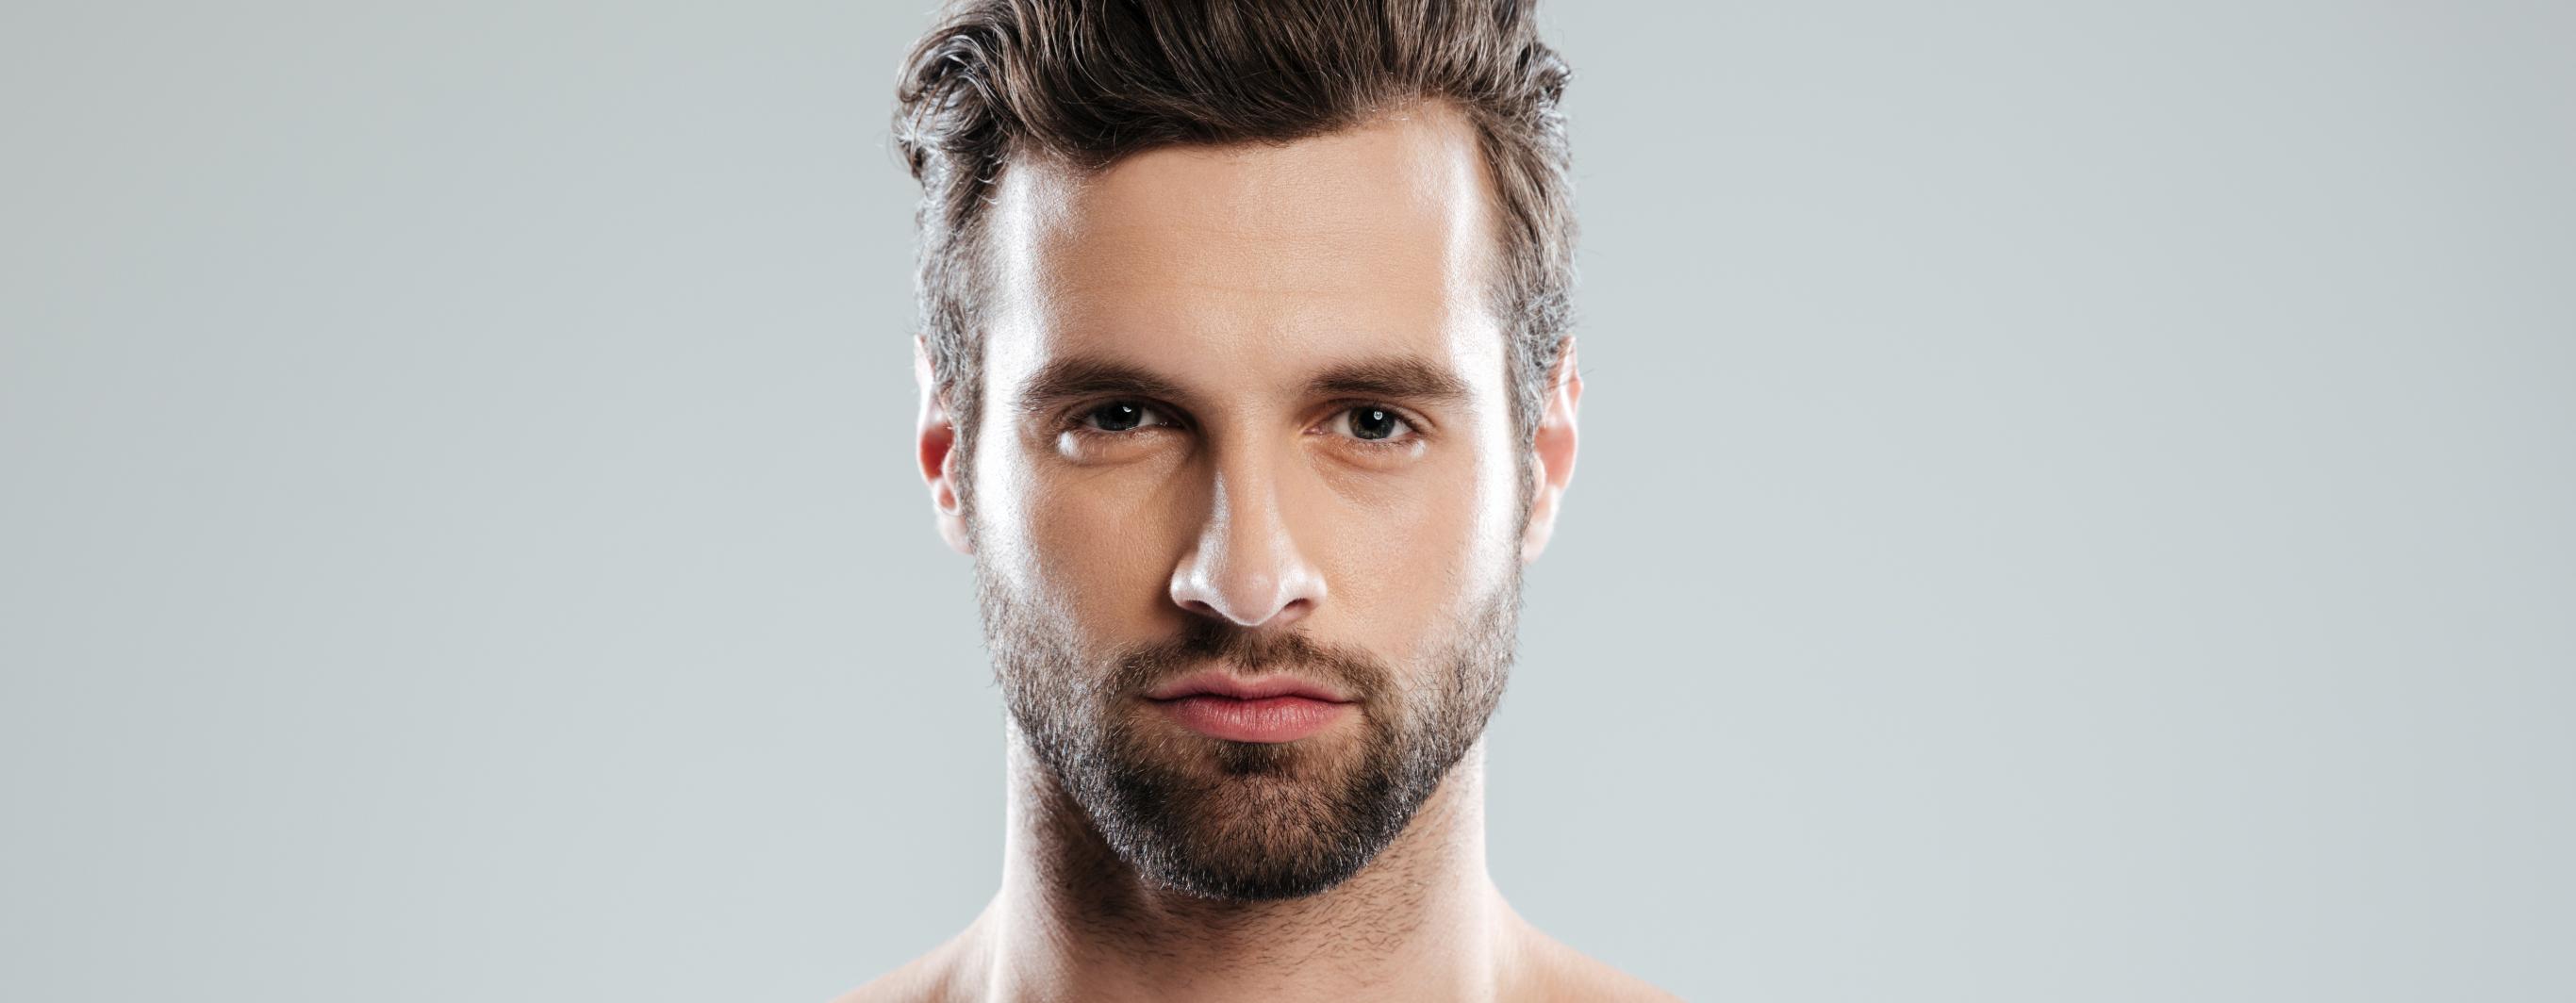 Barba corta cuadrada